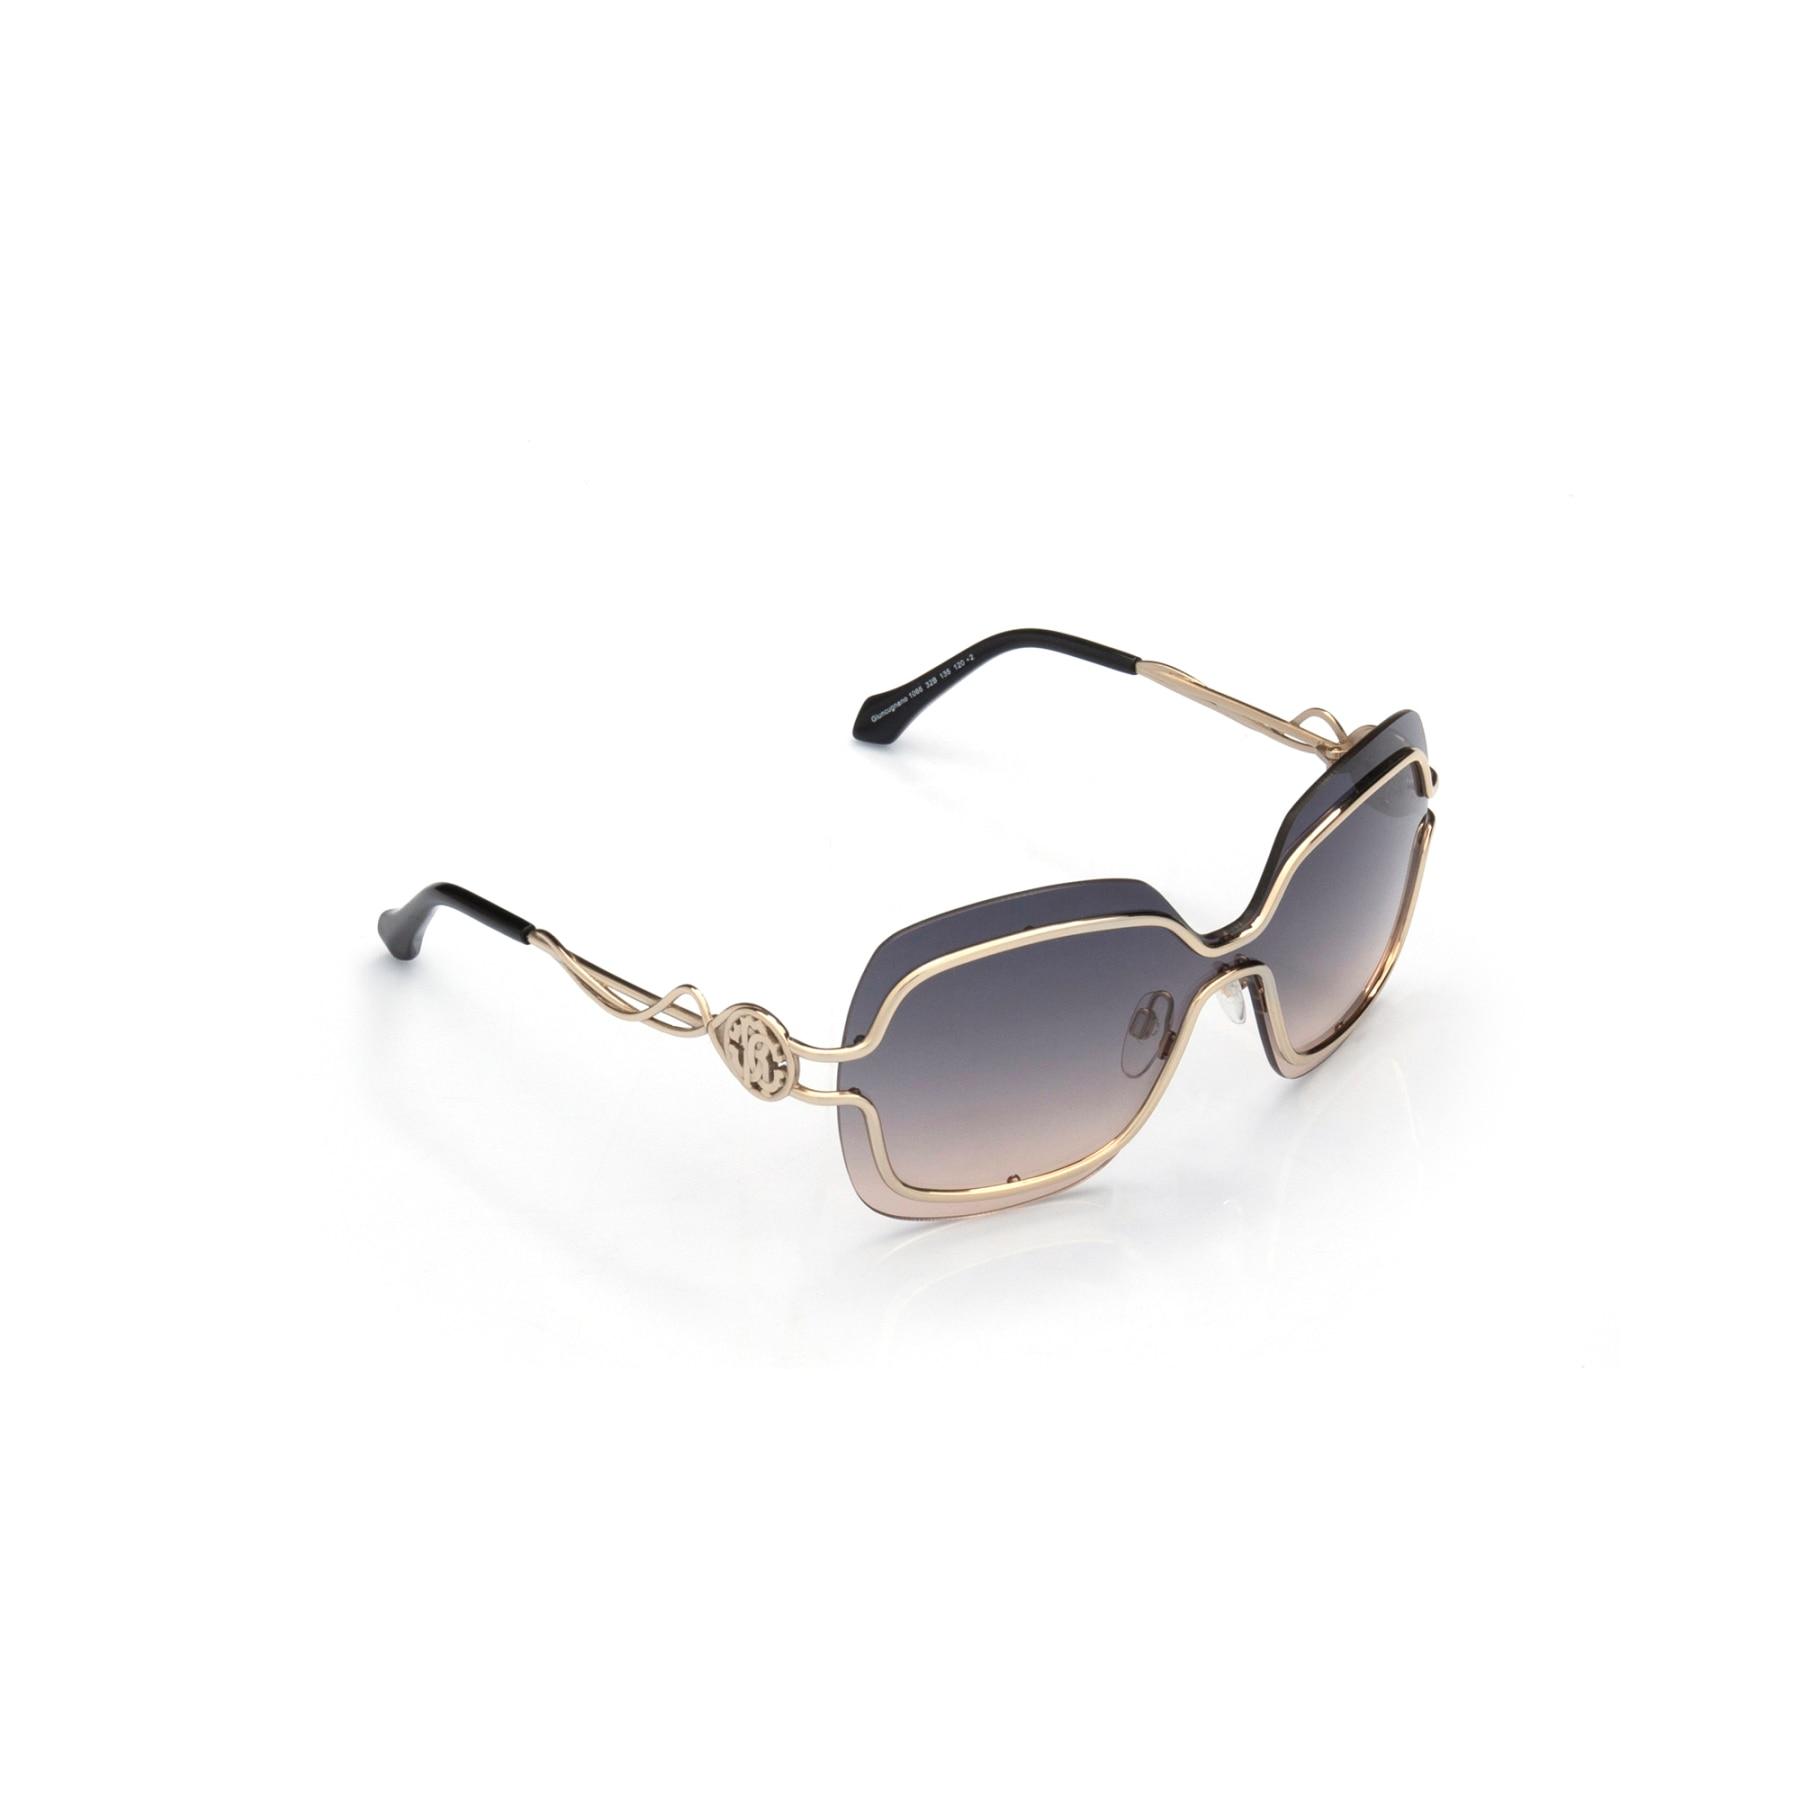 Women's sunglasses rc 1066 32b metal gold polycarbonate rectangular rectangle 60-16-120 roberto cavalli